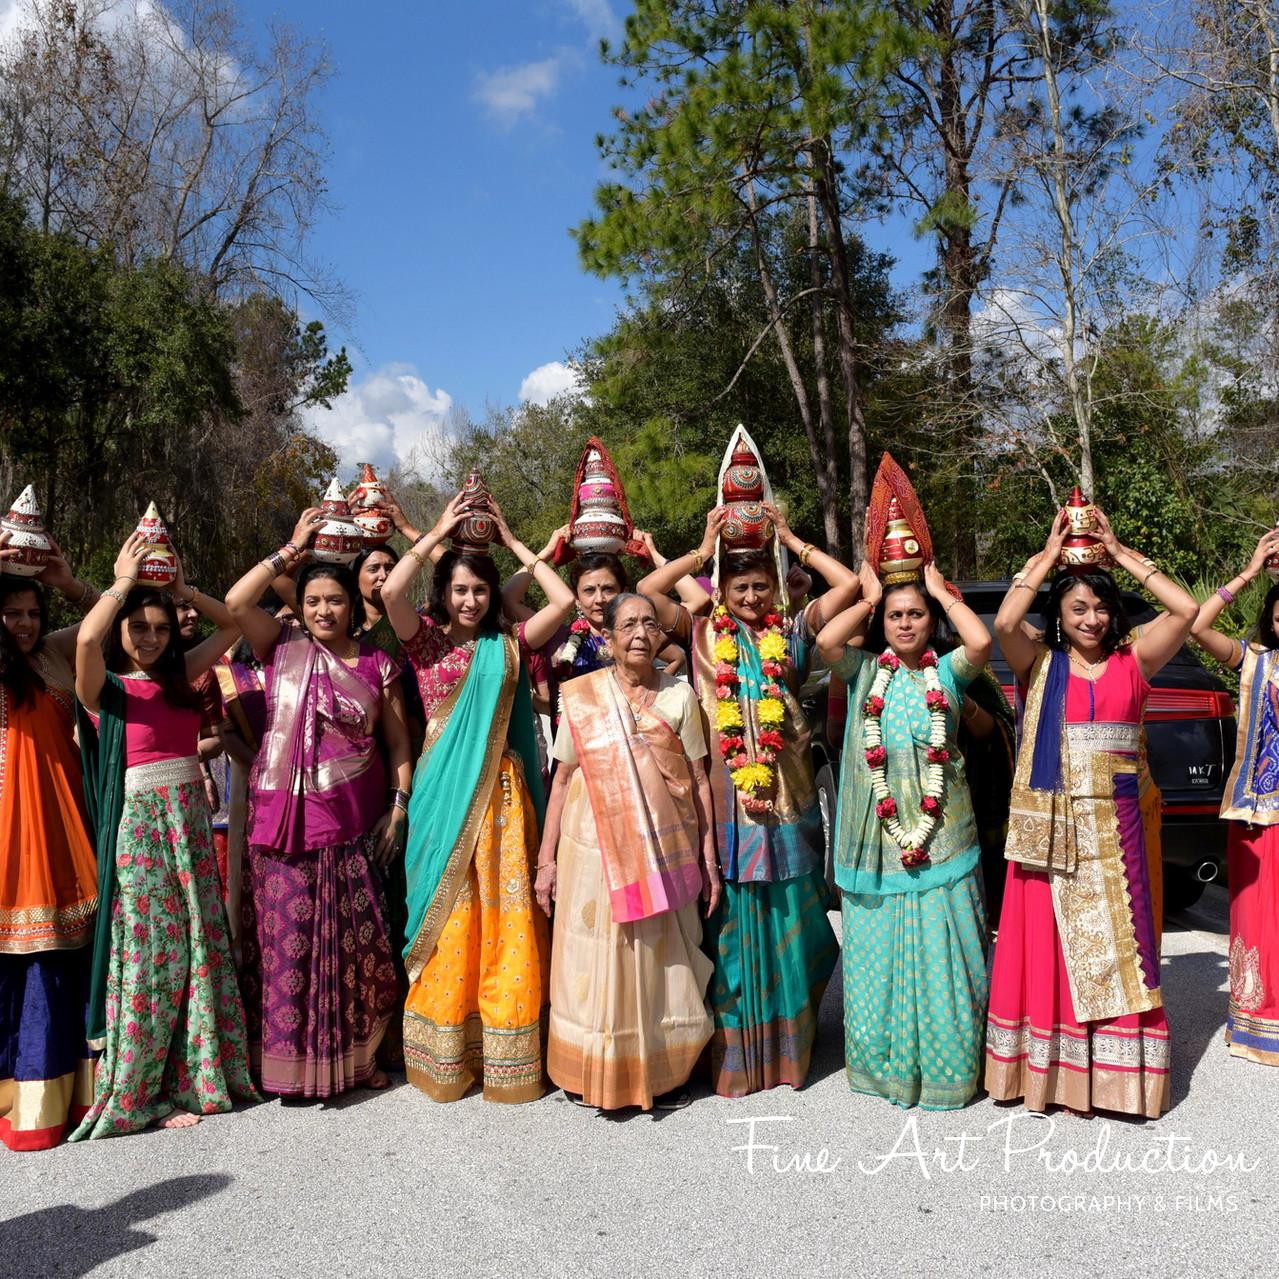 Hyatt-Regency-Grand-Cypress-Indian-Wedding-Vidhi-Photography-Fine-Art-Production-Amish-Thakkar_13